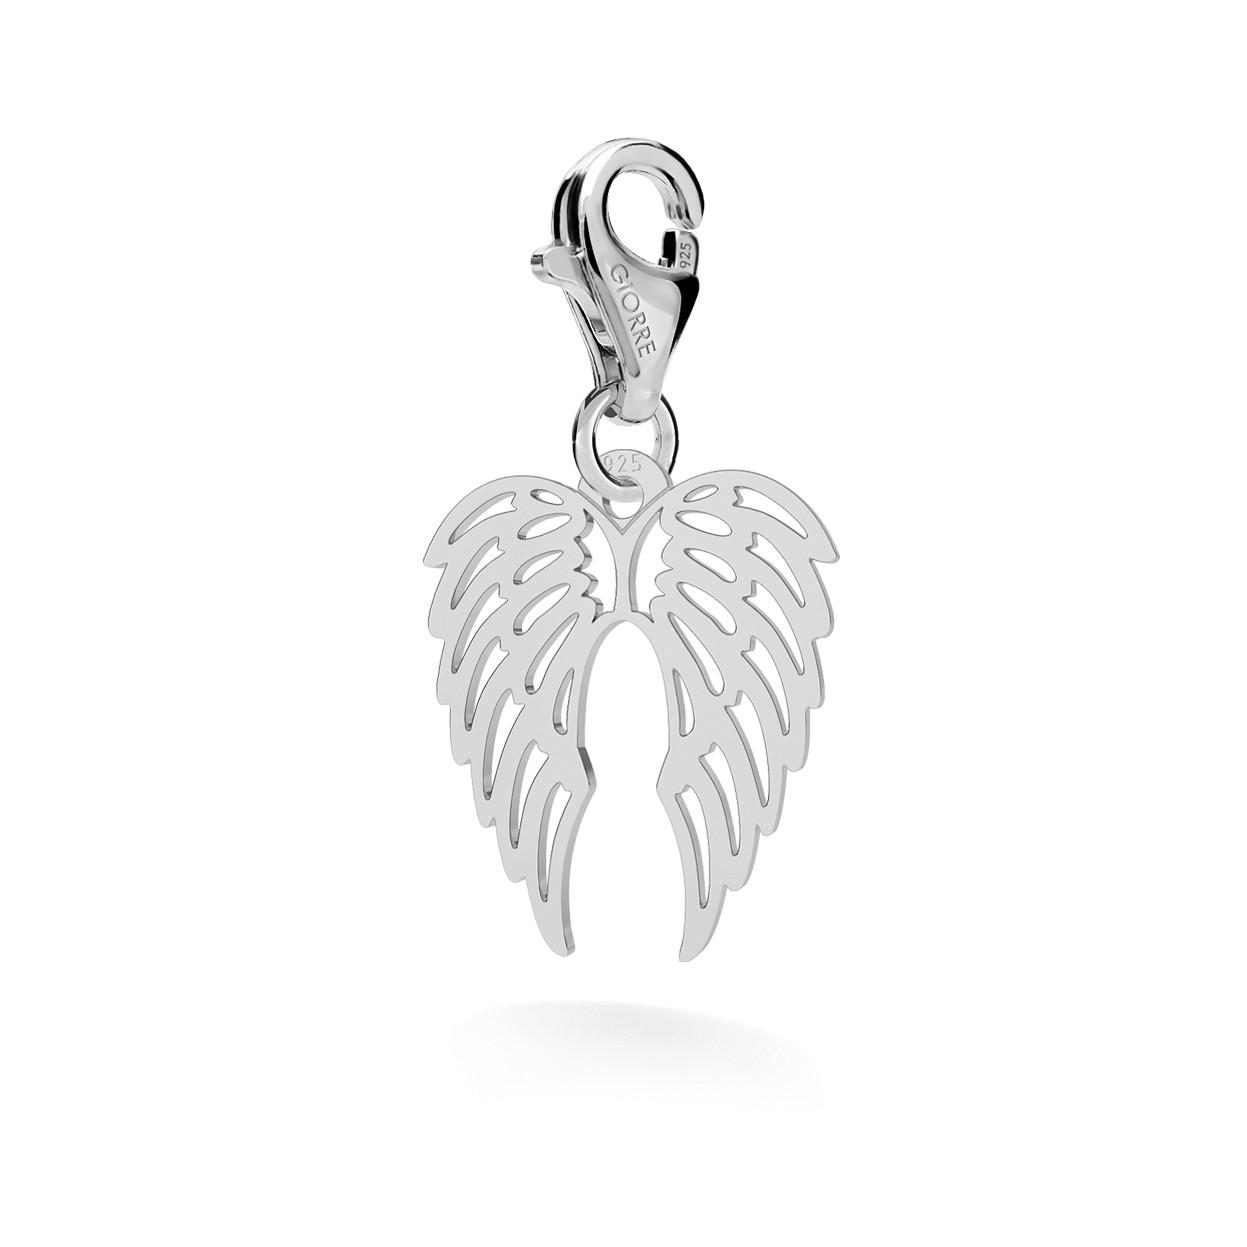 ANGEL WINGS, CHARMS 211